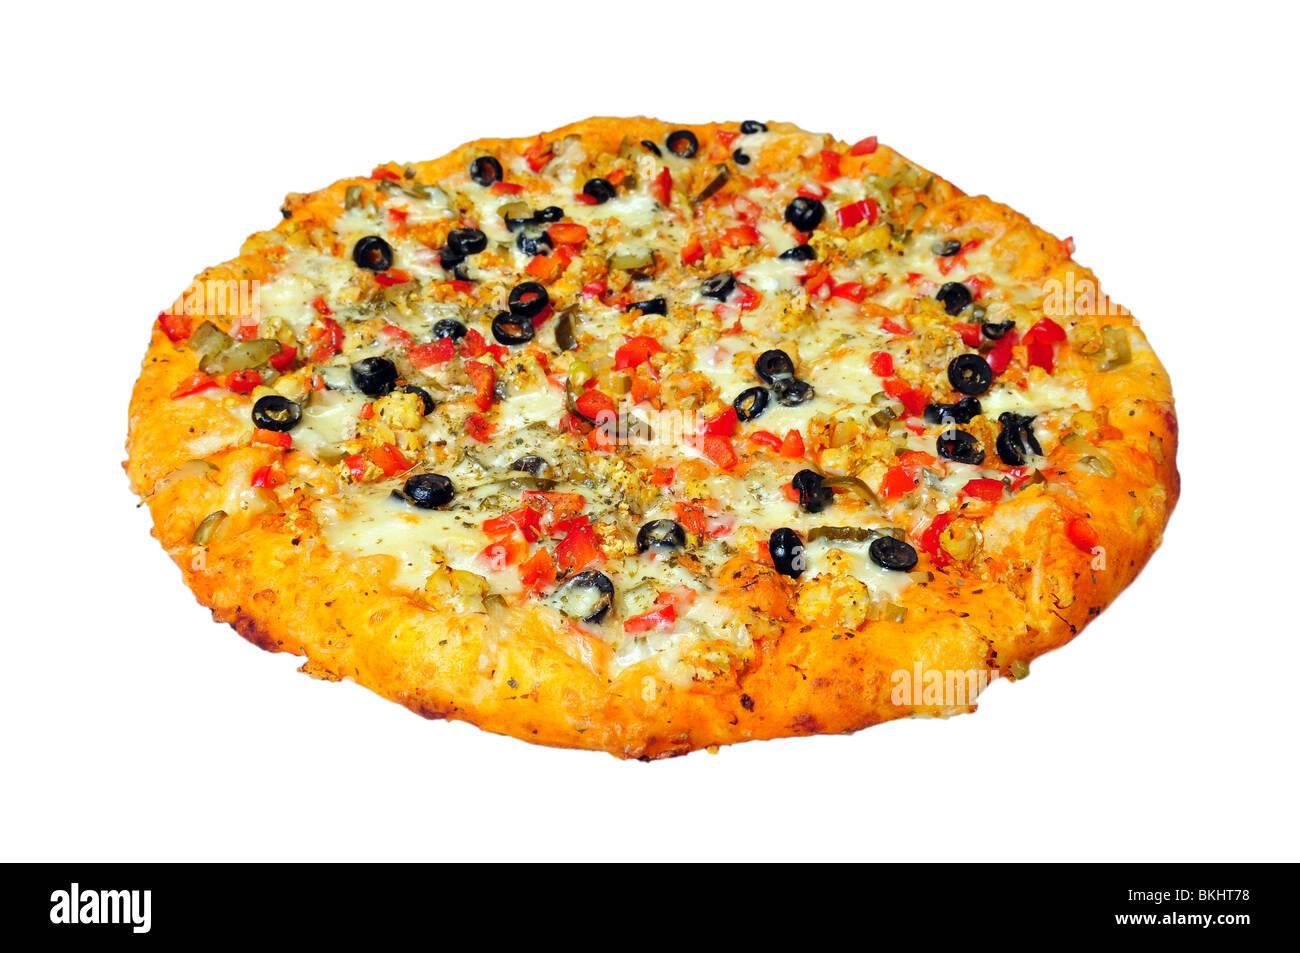 Pizza redonda aislado en blanco Imagen De Stock